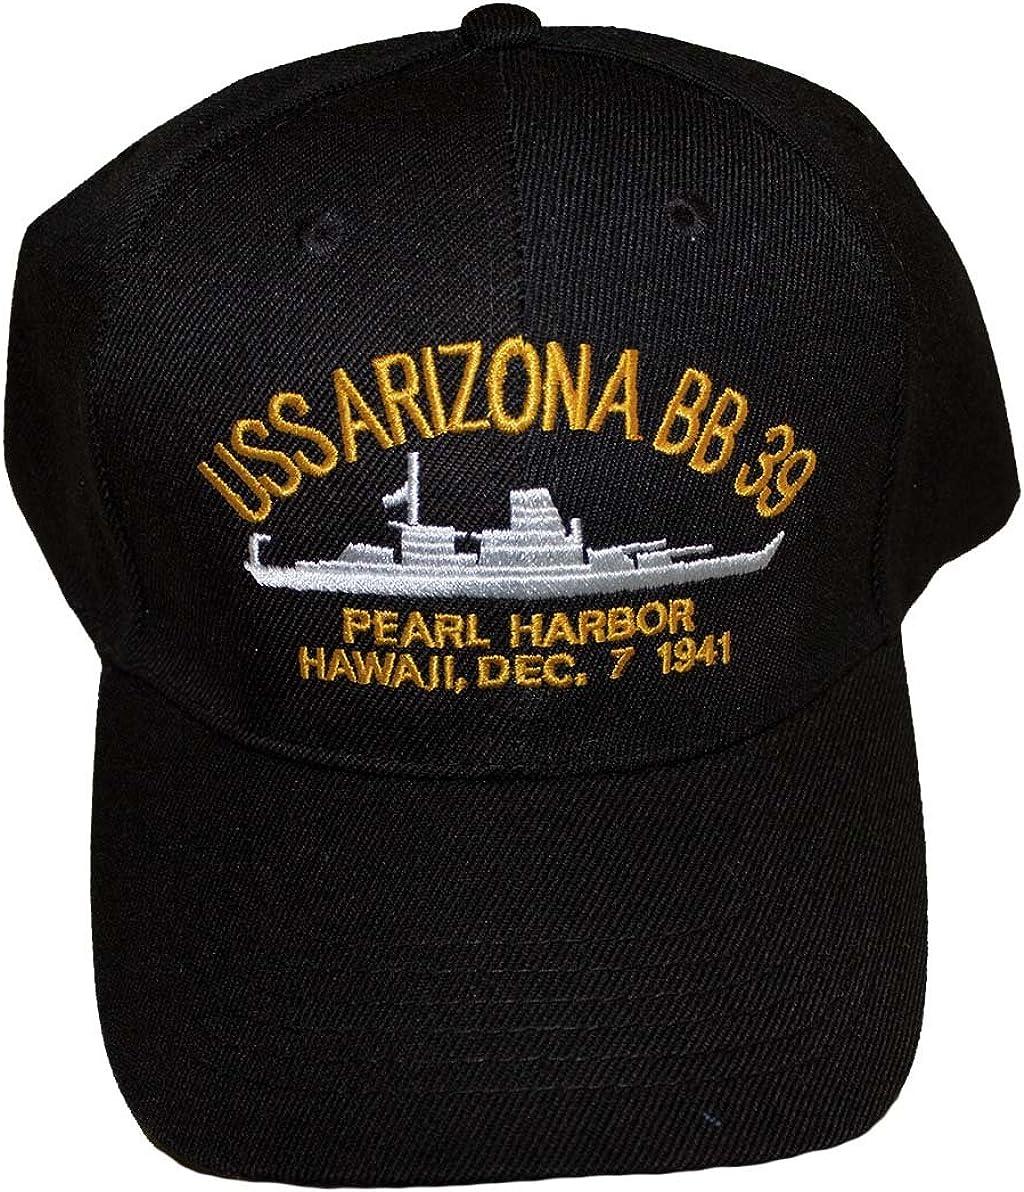 Embroidered USS Arizona Battle Ship Dec. Max 76% OFF 7 OFFer Harbor Hawaii Pearl